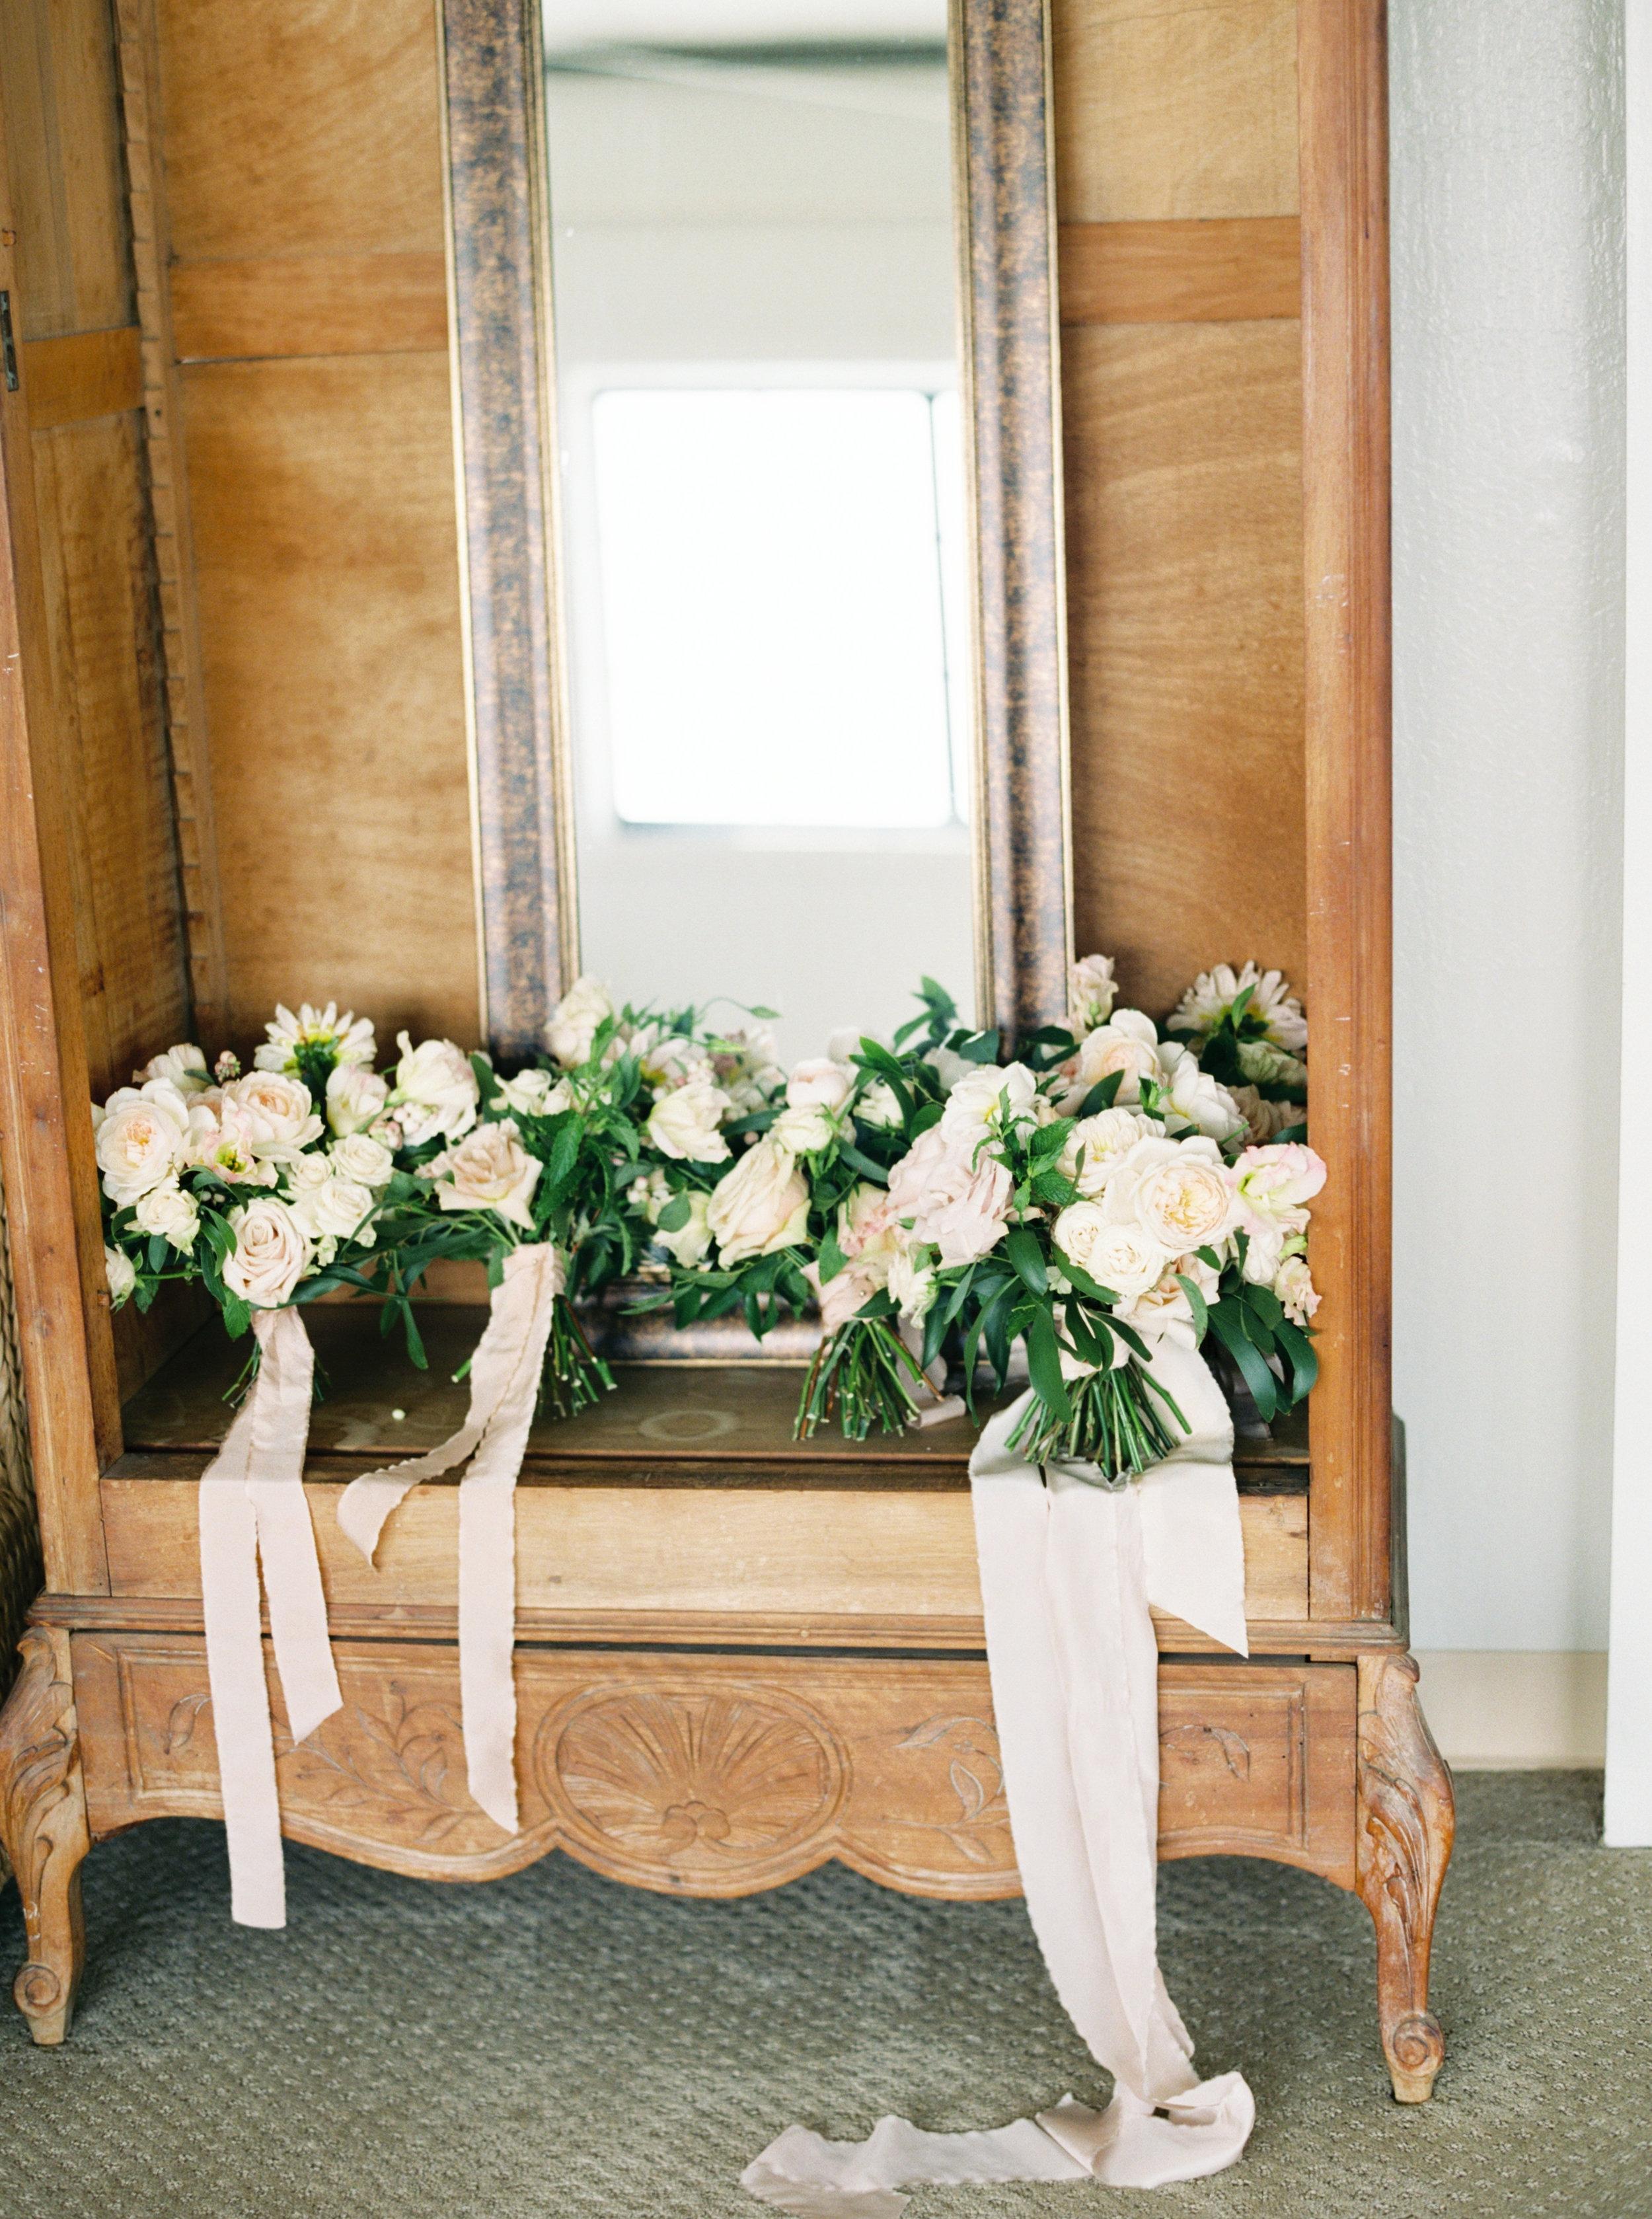 trynhphoto_socal_sf_halfmoon_bay_wedding_photographer_JA-27.jpg